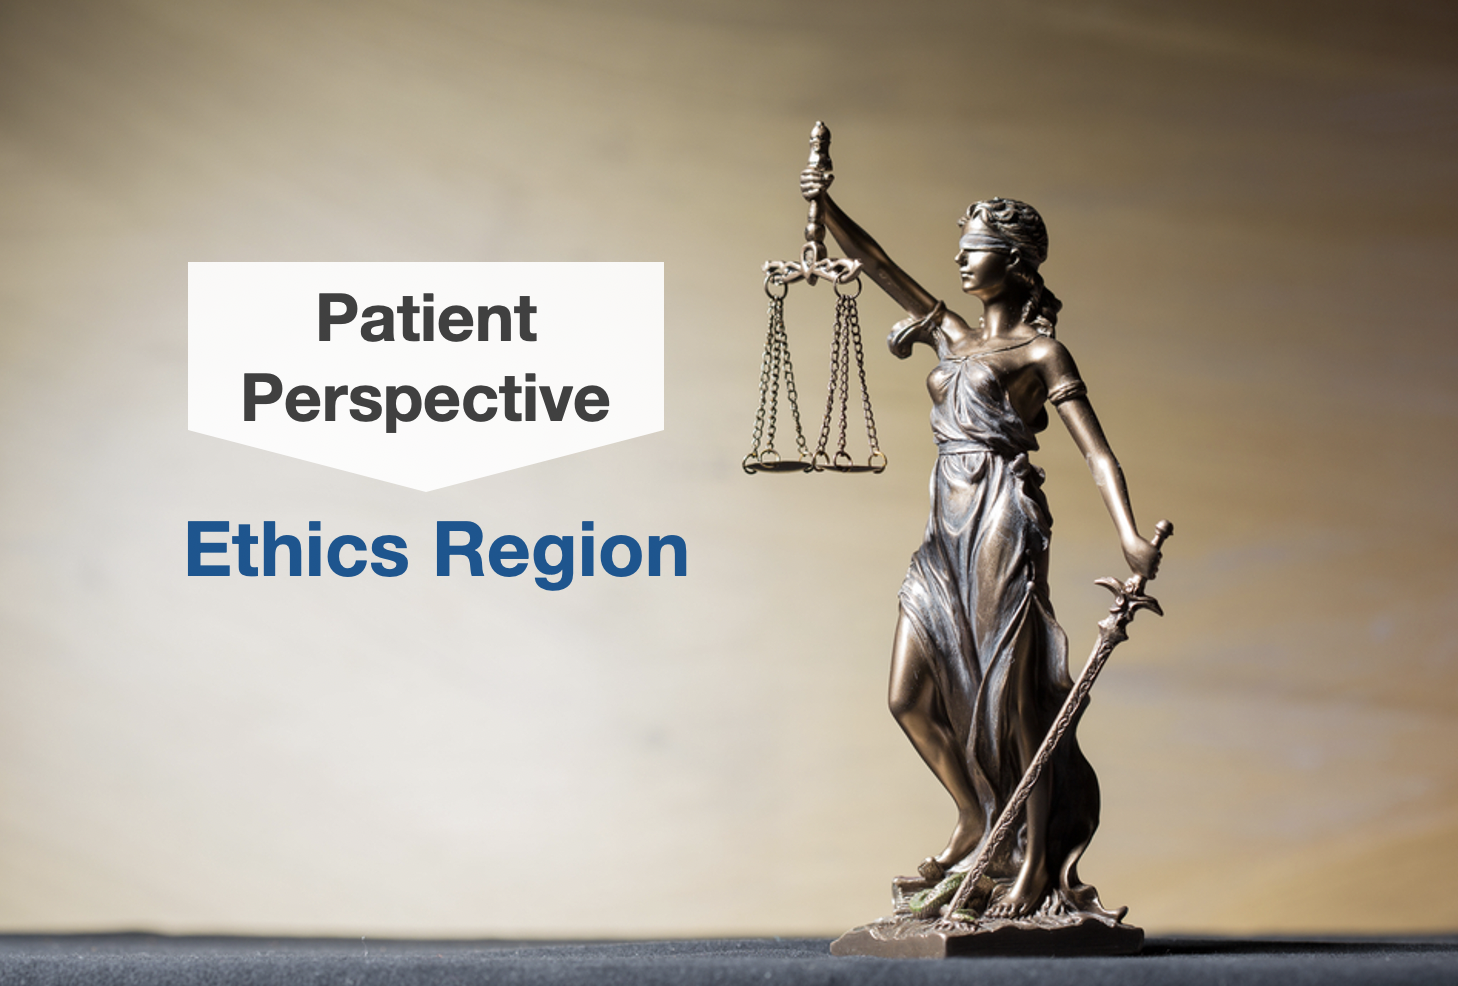 NM20 Patient Perspective Ethics